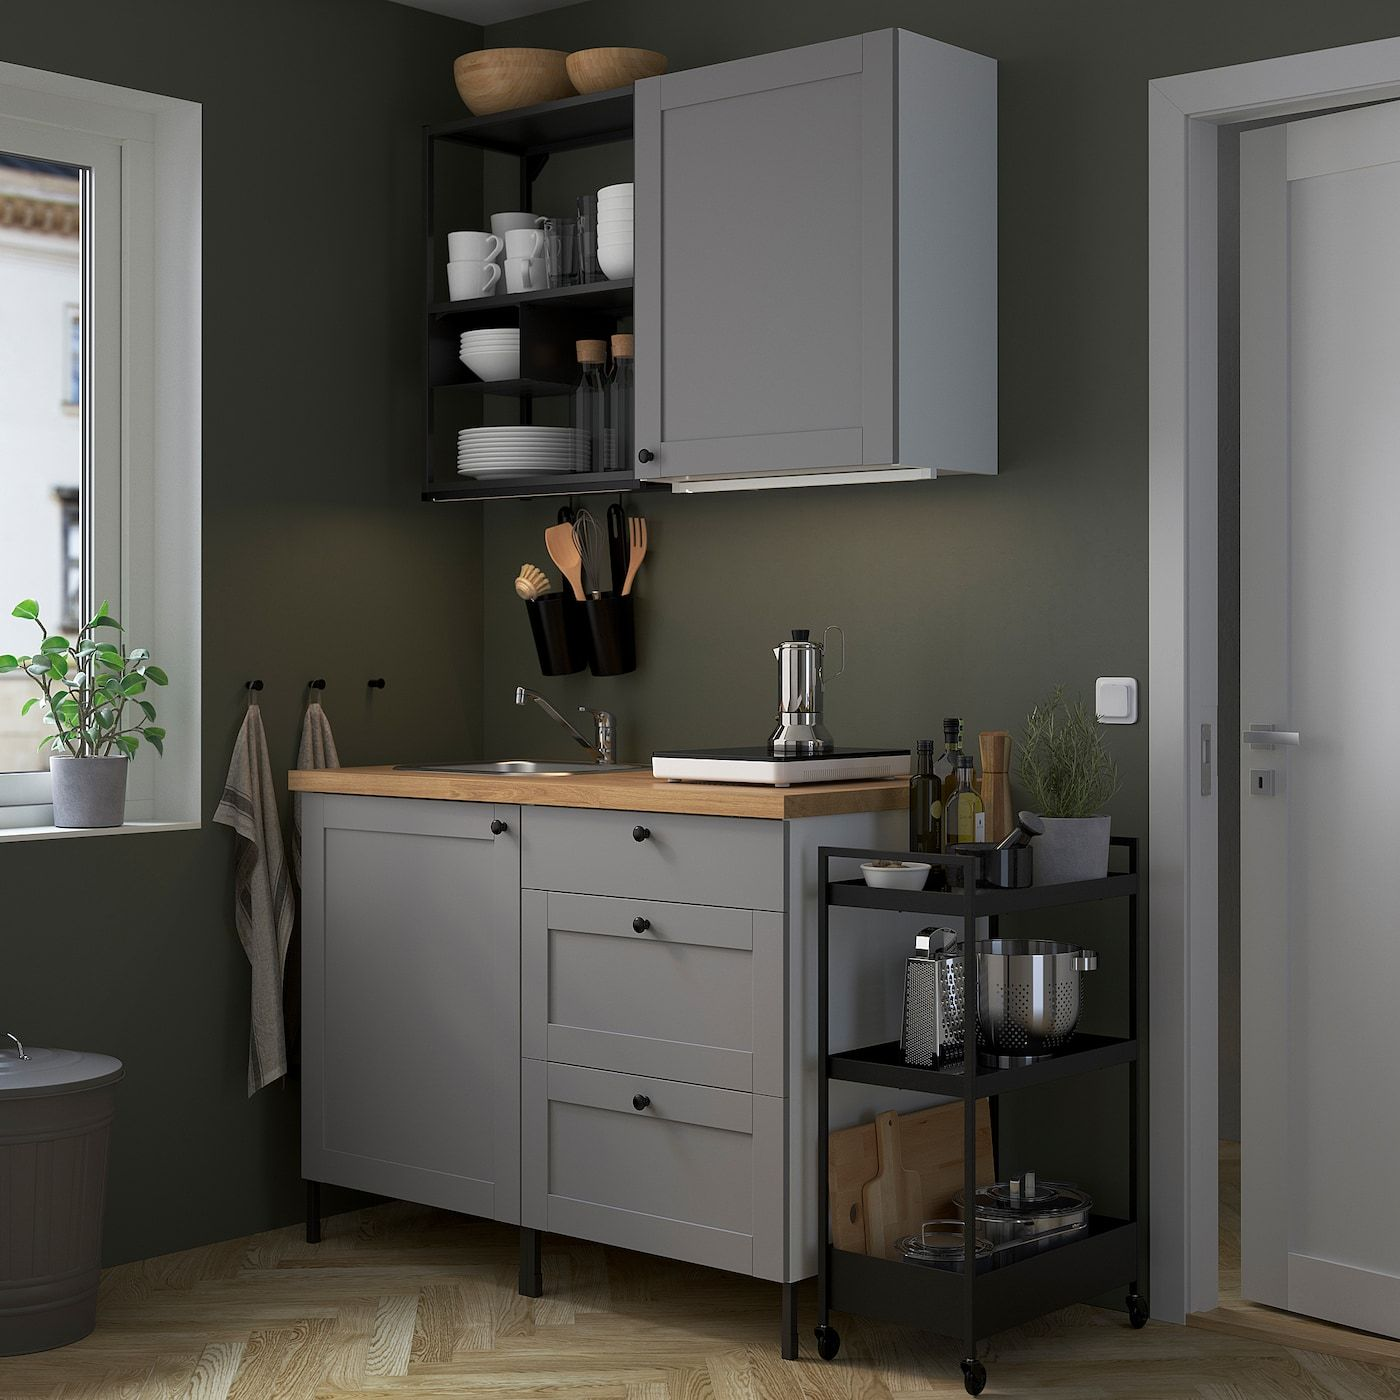 enhet keuken antraciet grijs frame